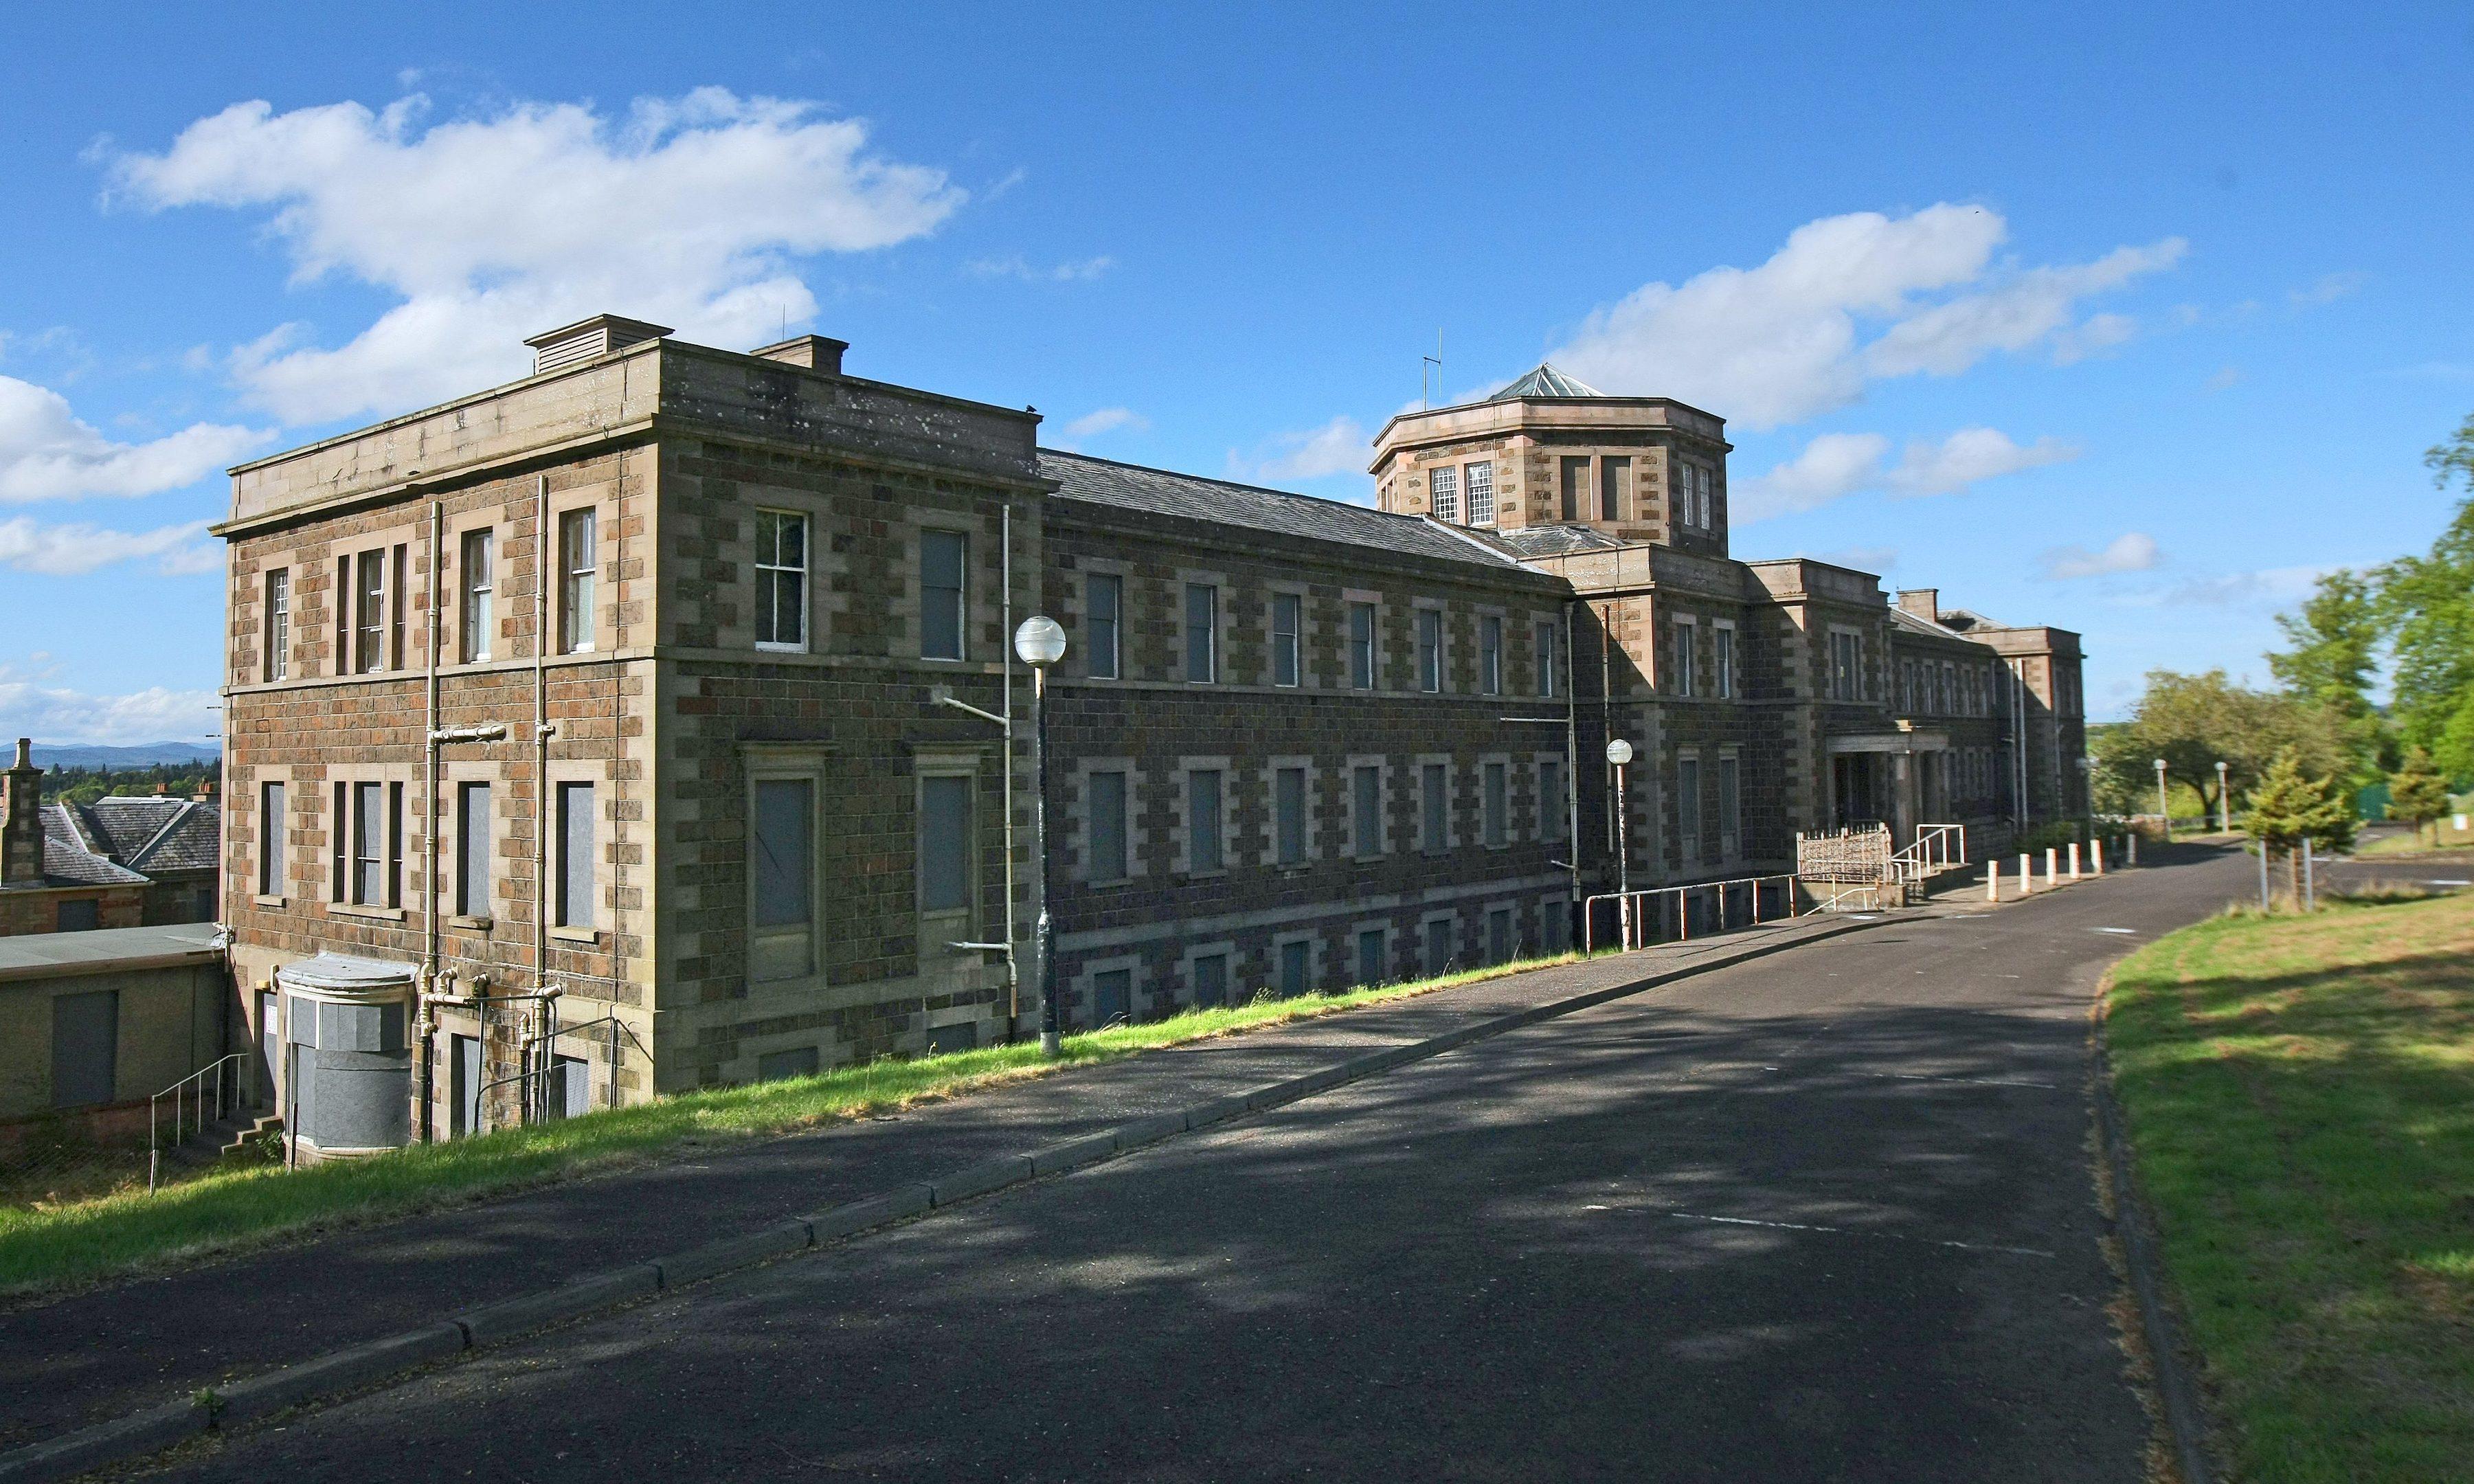 The old Murray Royal hospital.